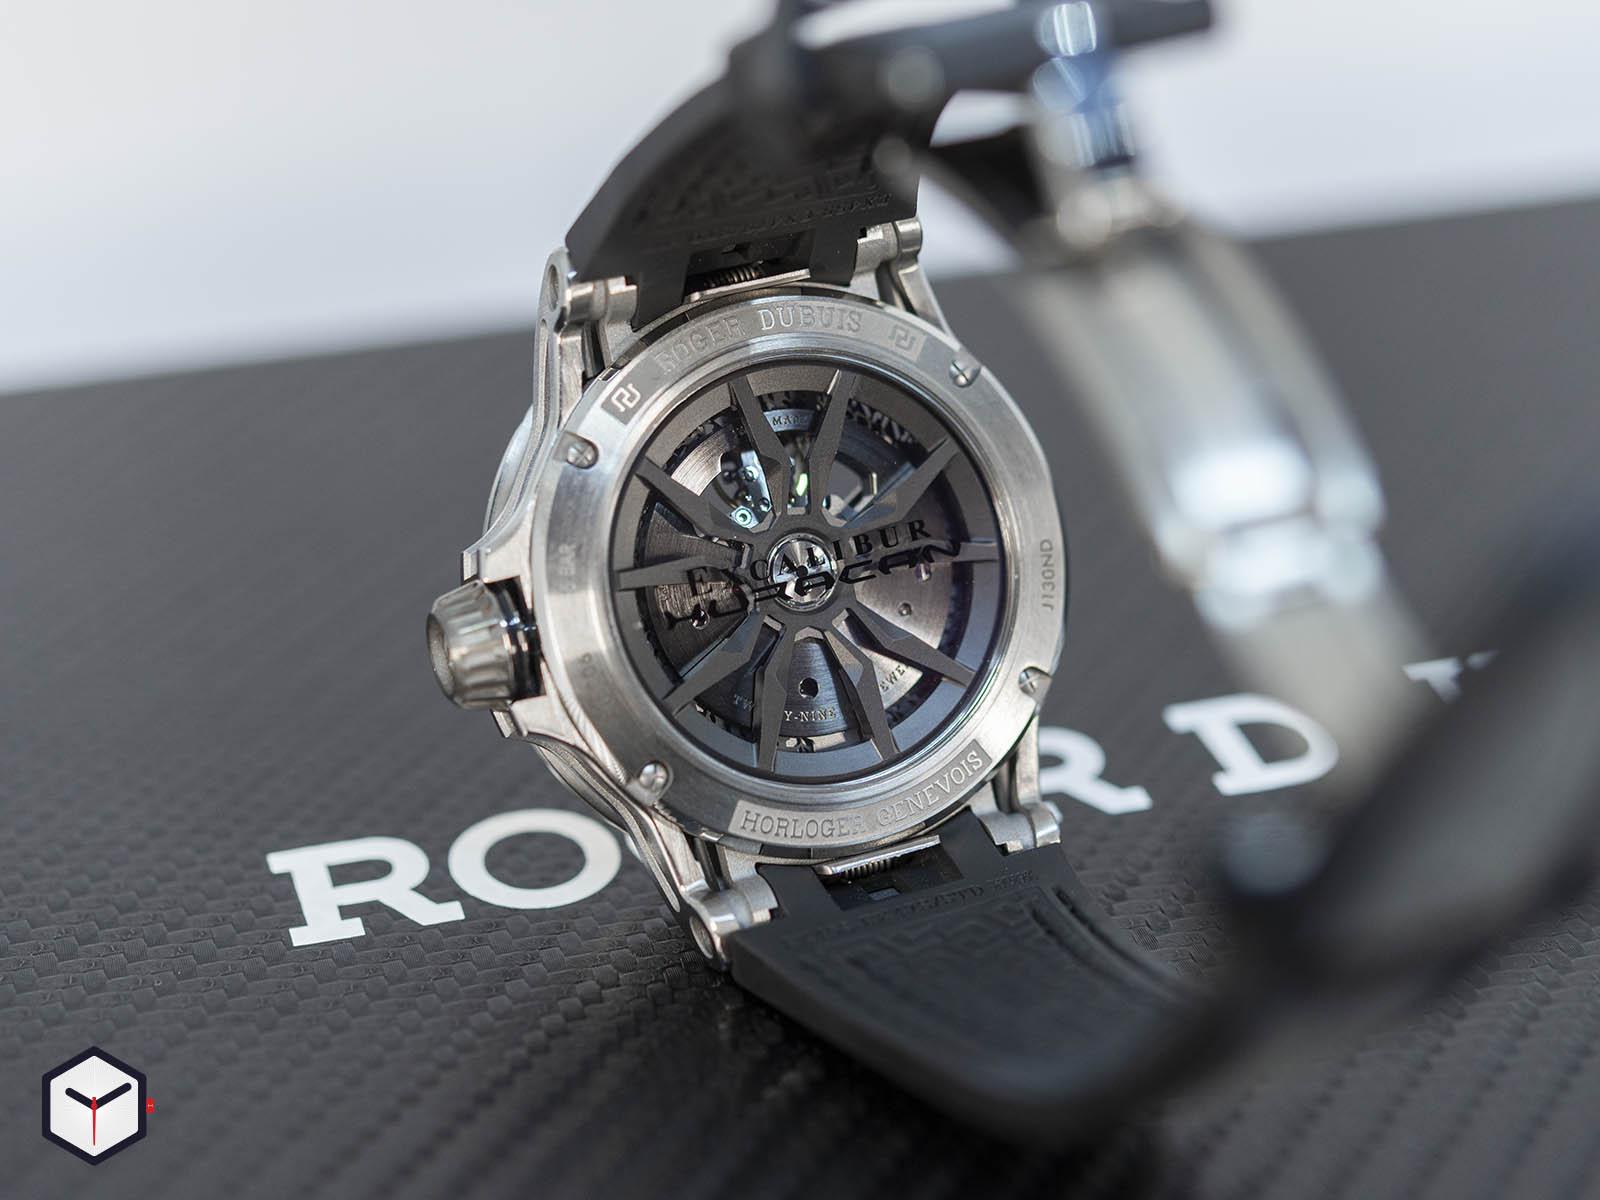 rddbex0748-roger-dubuis-excalibur-huracan-sihh-2019-5.jpg